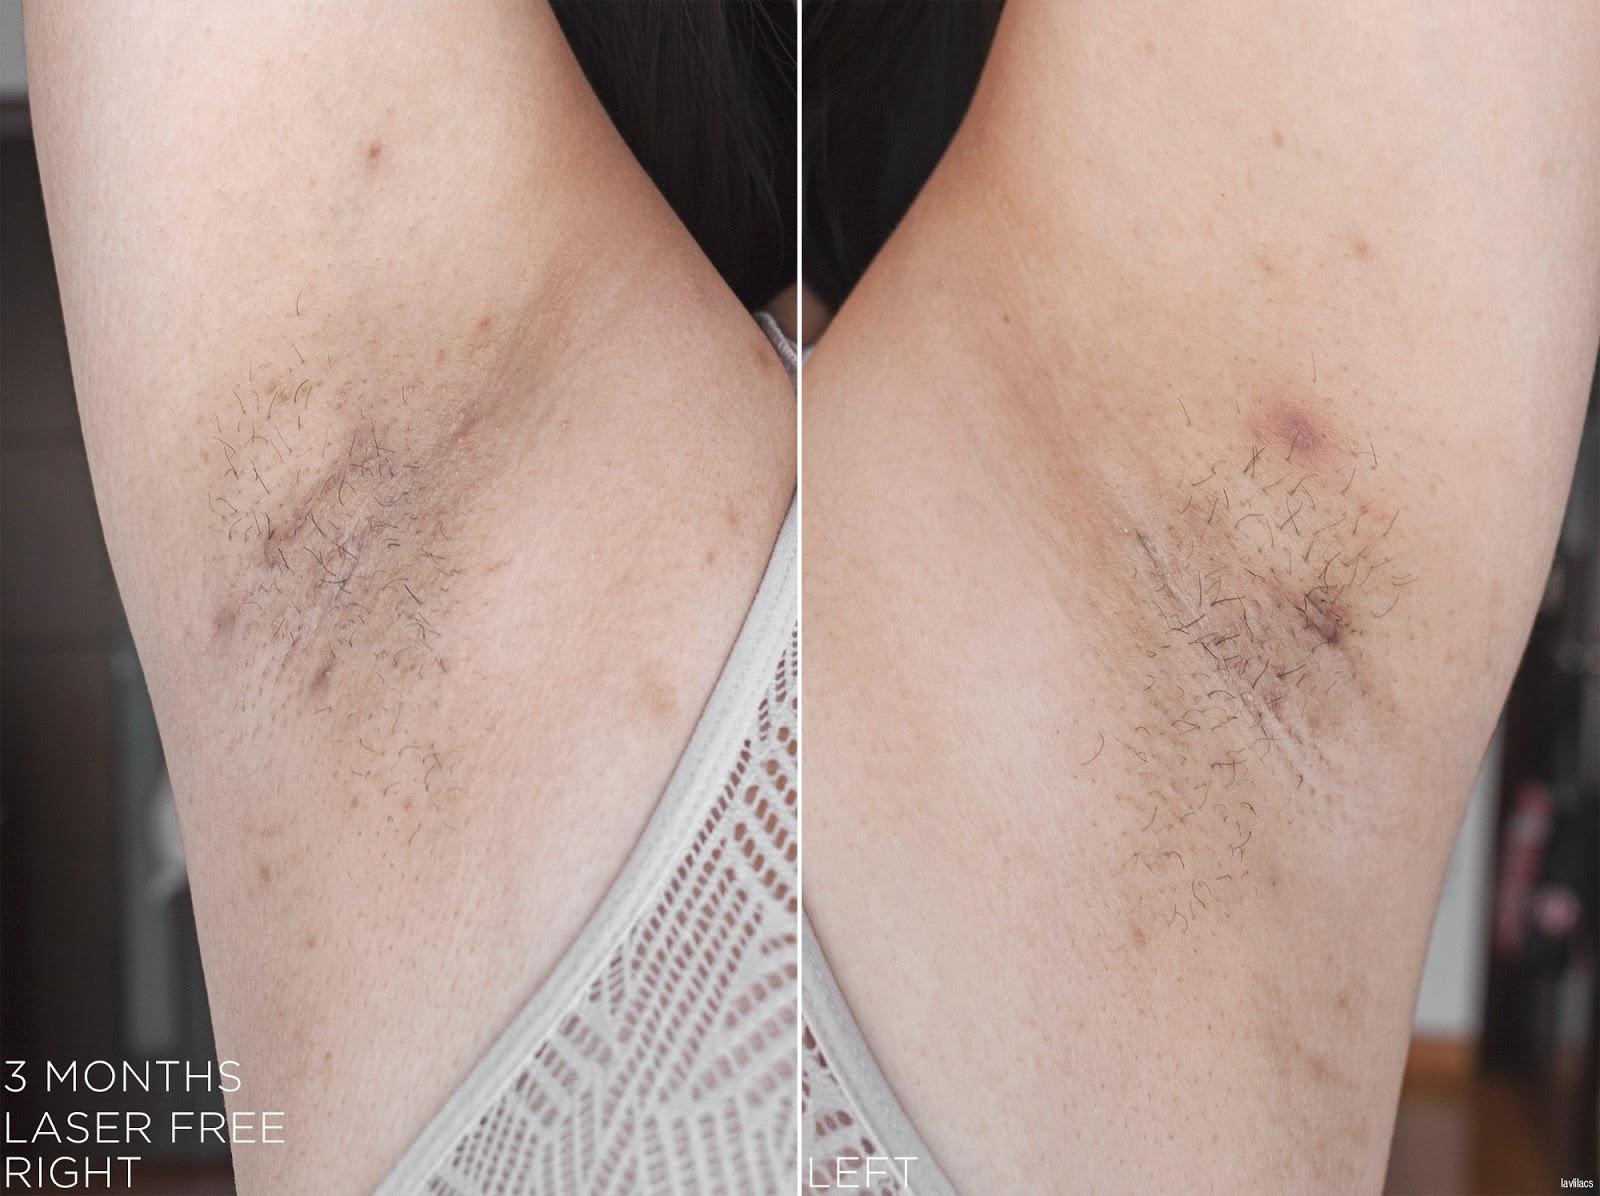 tria Hair Removal Laser Armpits Hair 3 Months Laser Free